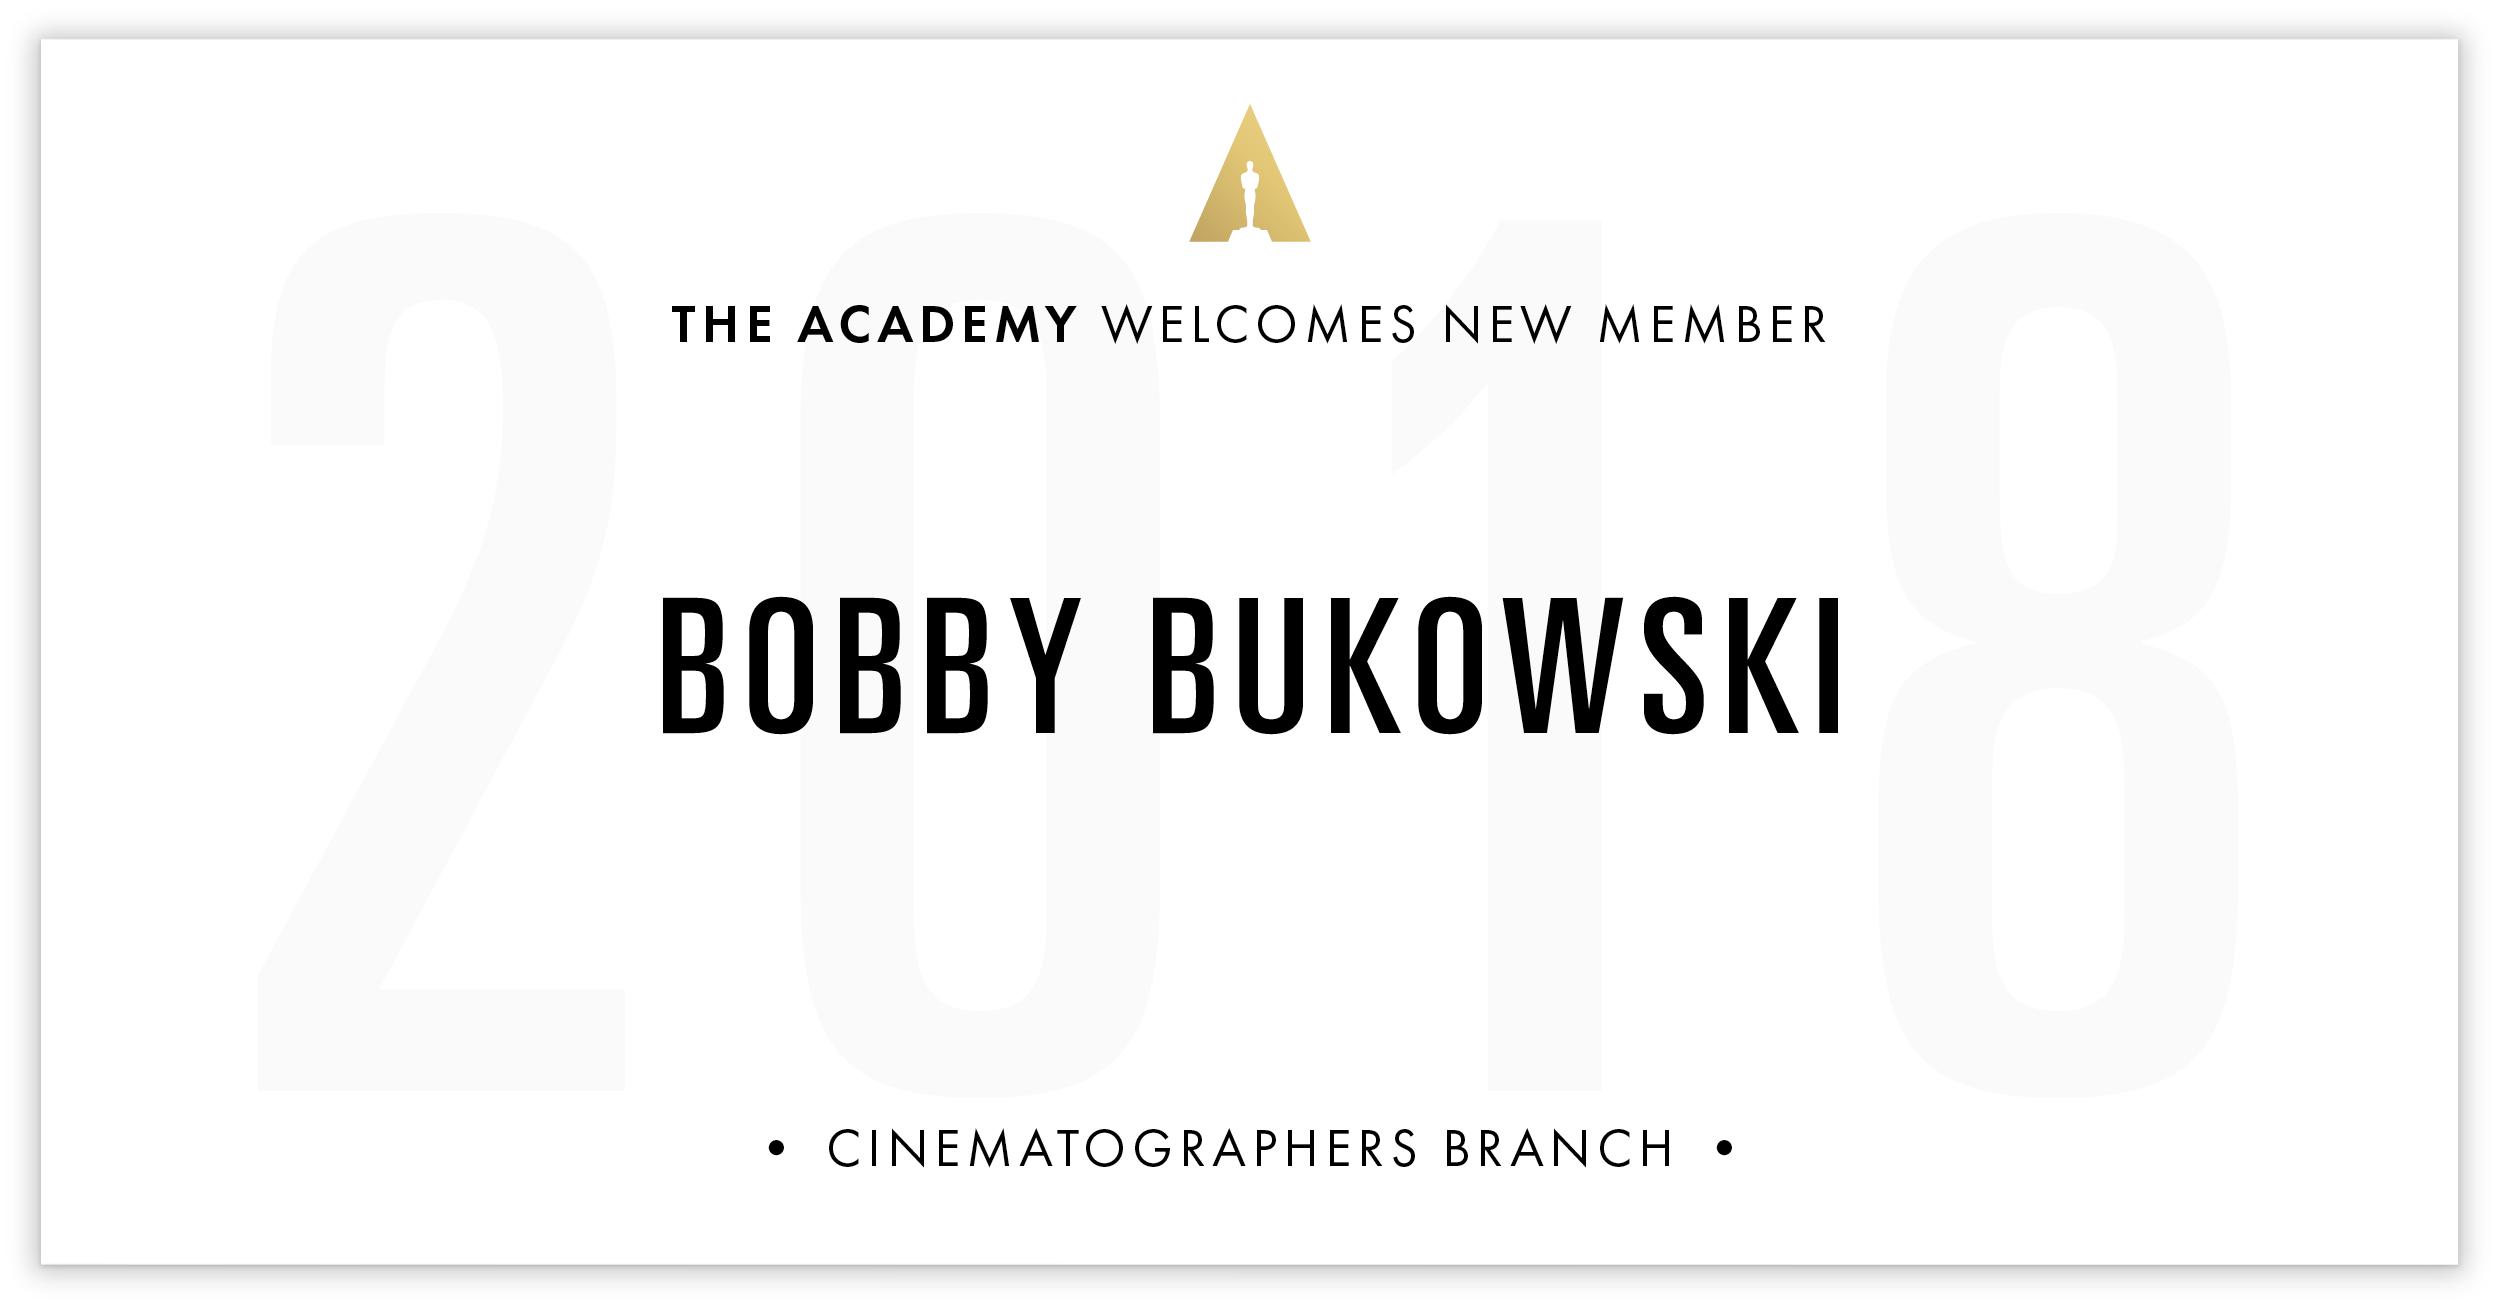 Bobby Bukowski is invited!